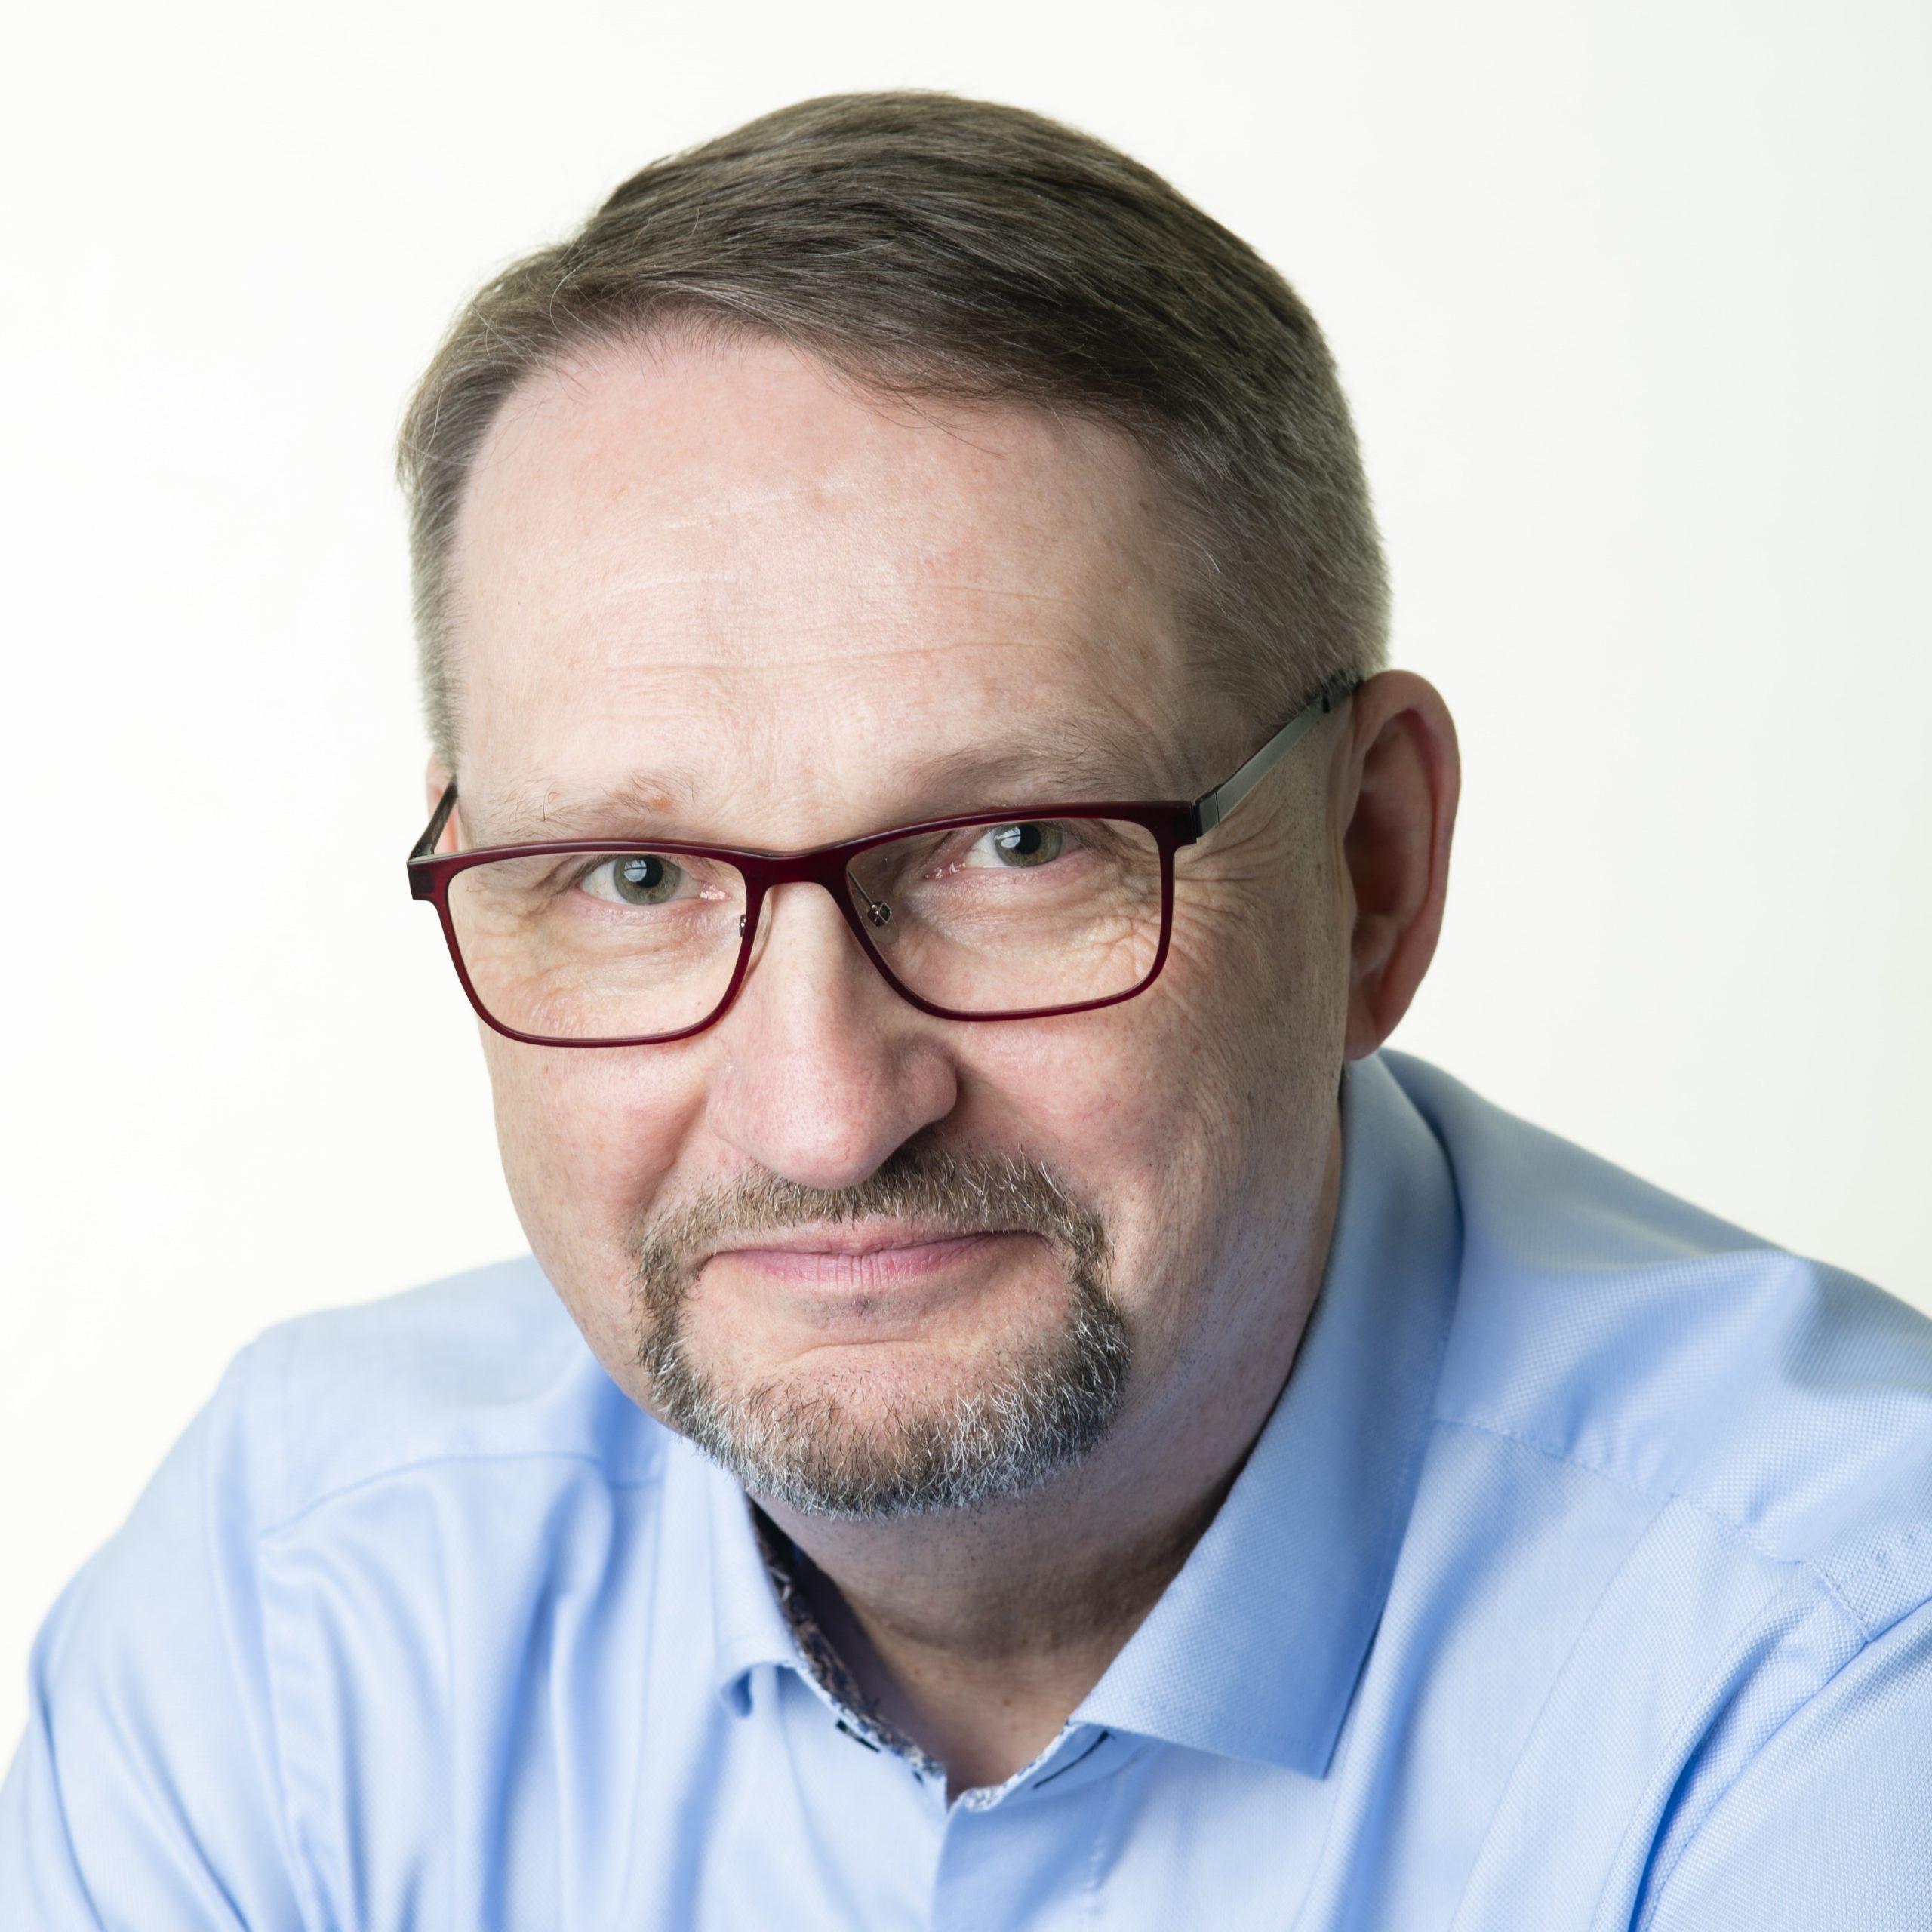 Juha Ropilo